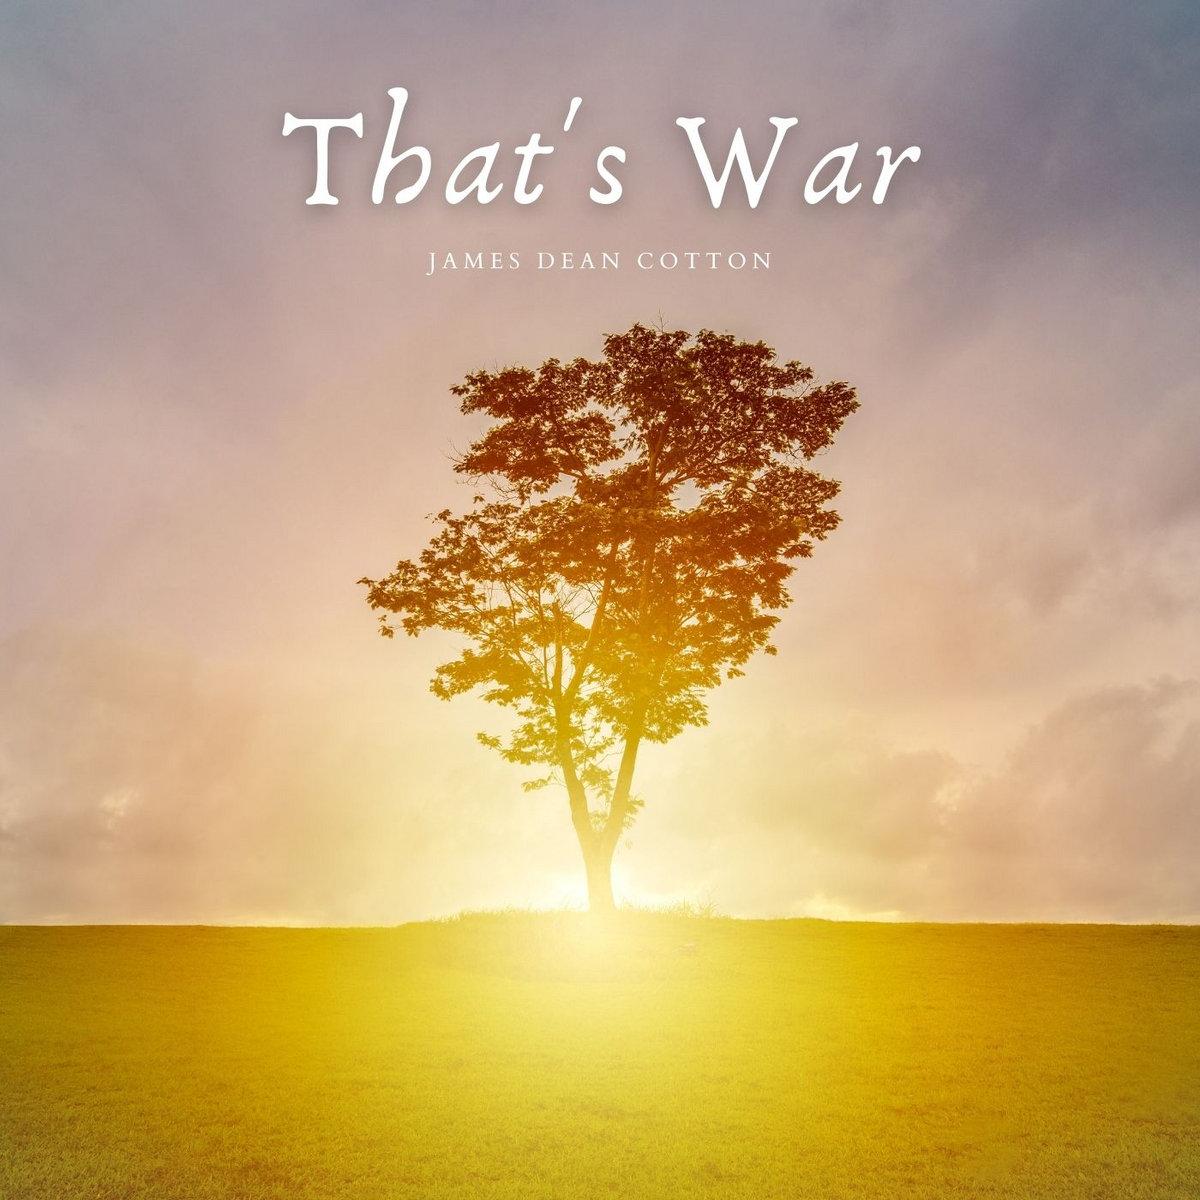 That's War by James Dean Cotton